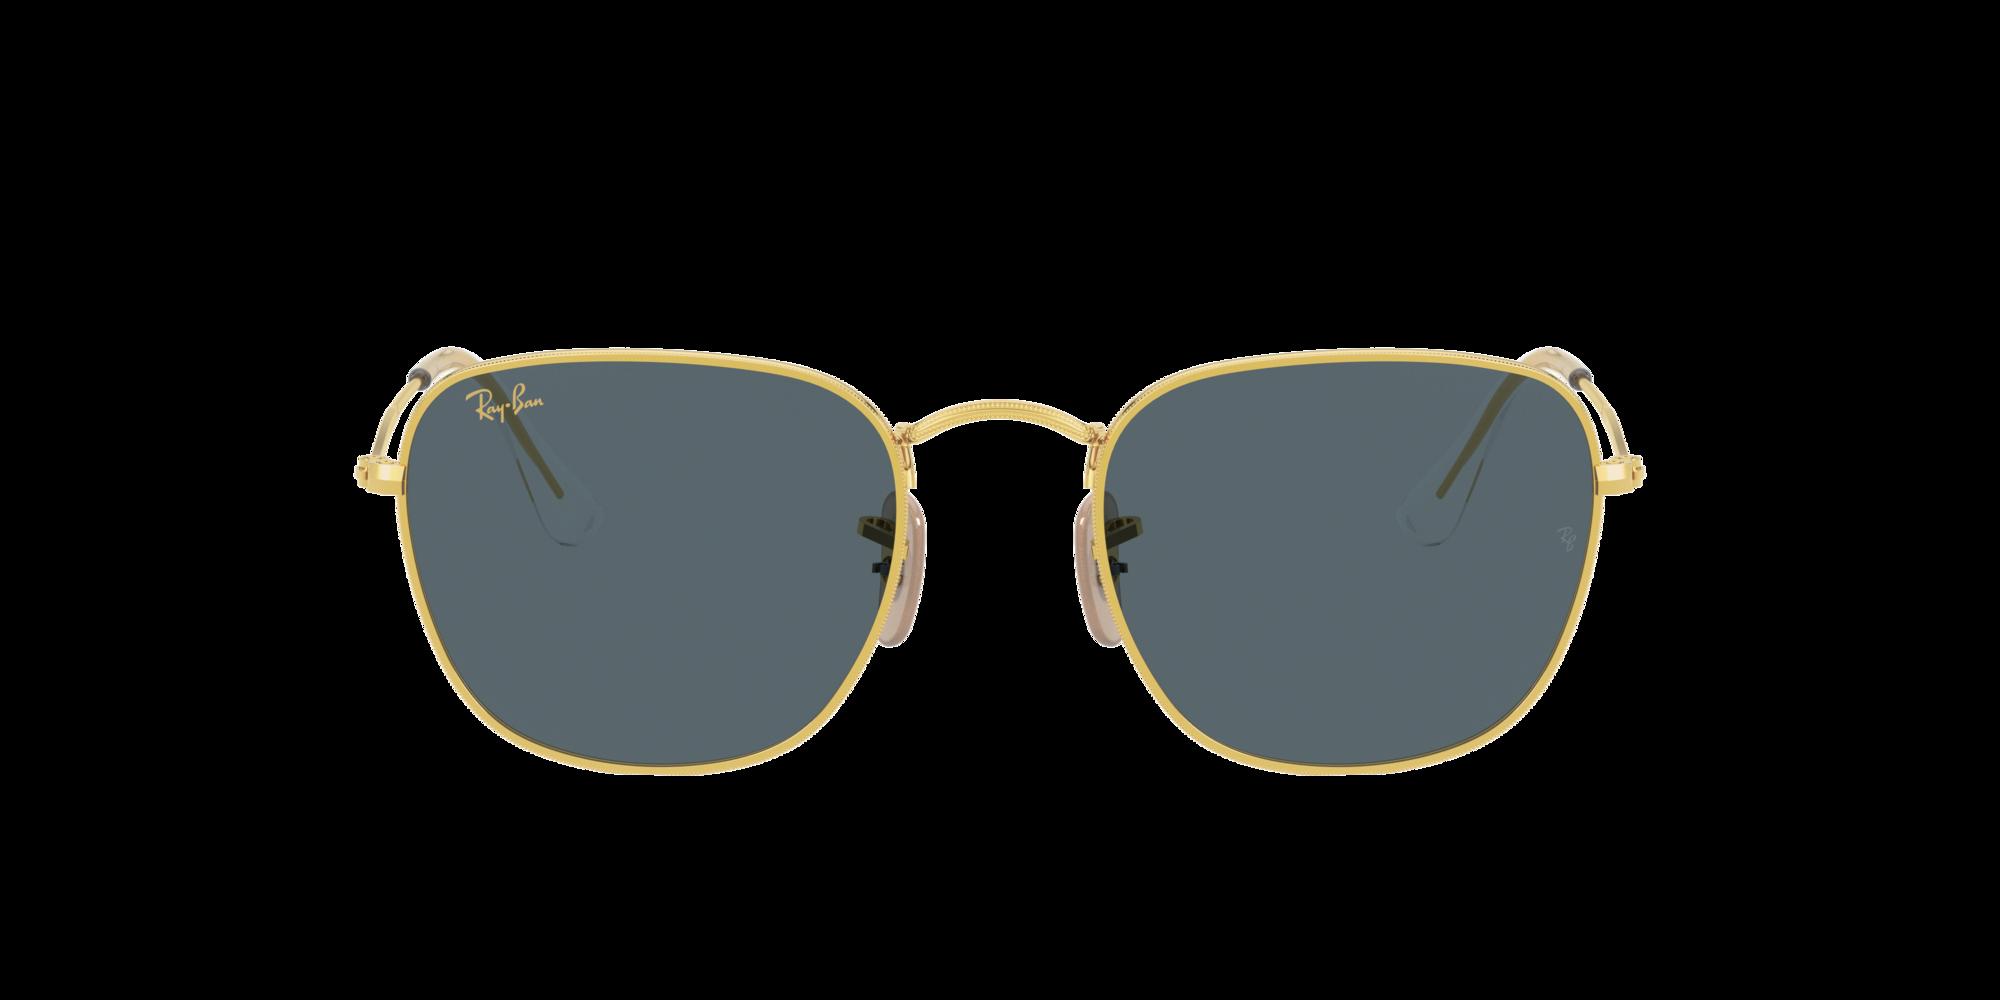 Image for RB3857 51 FRANK from LensCrafters | Glasses, Prescription Glasses Online, Eyewear